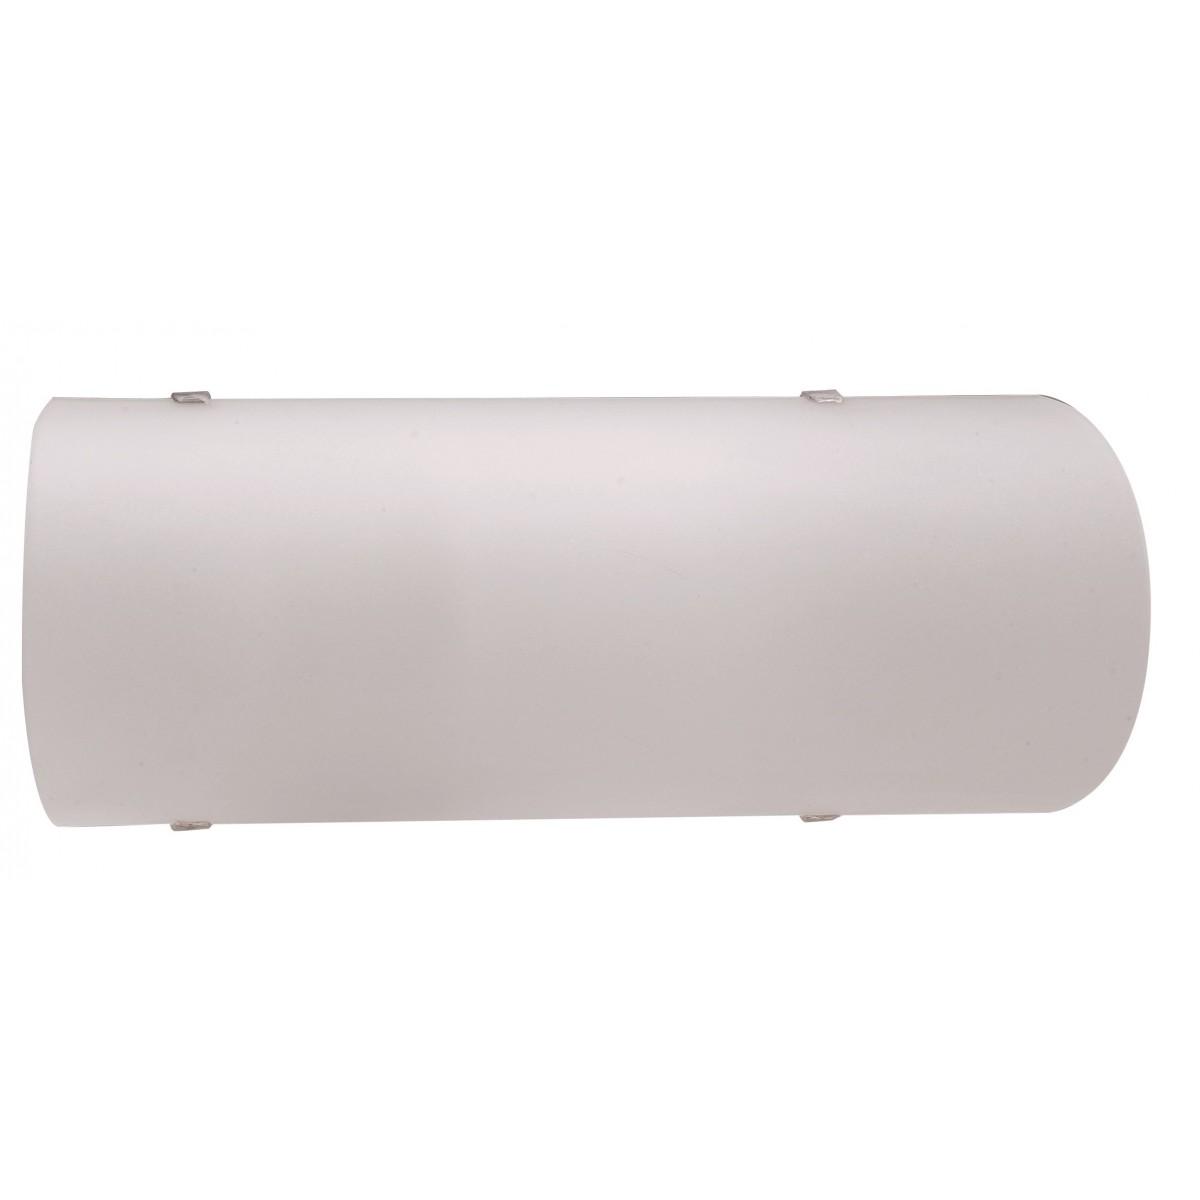 I-AMY / AP - Applique simple en verre blanc Classic Interior E27